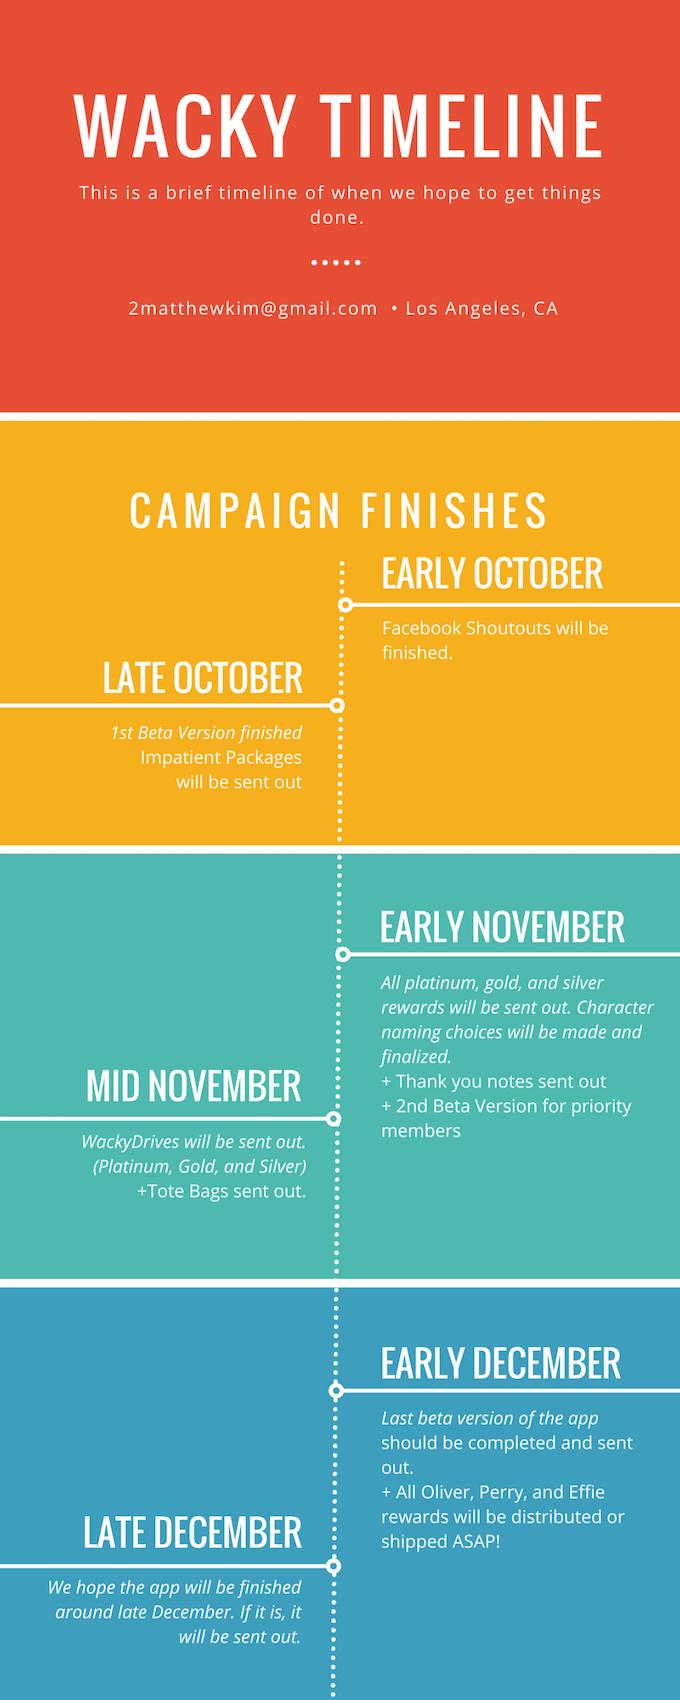 A brief timeline.